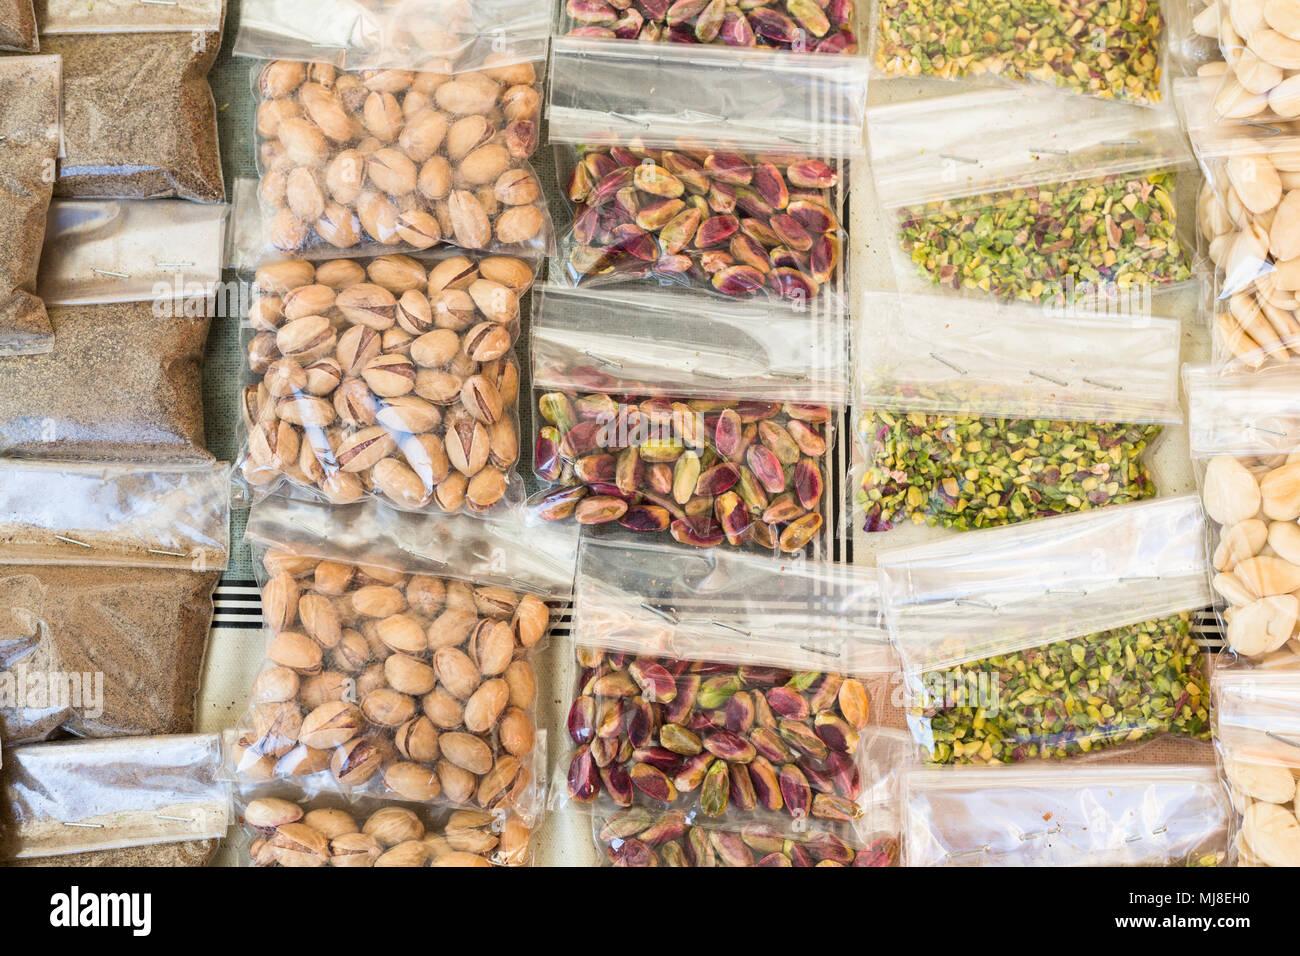 Pistachio nuts, Palermo, Ballarò market, Sicily, Italy - Stock Image